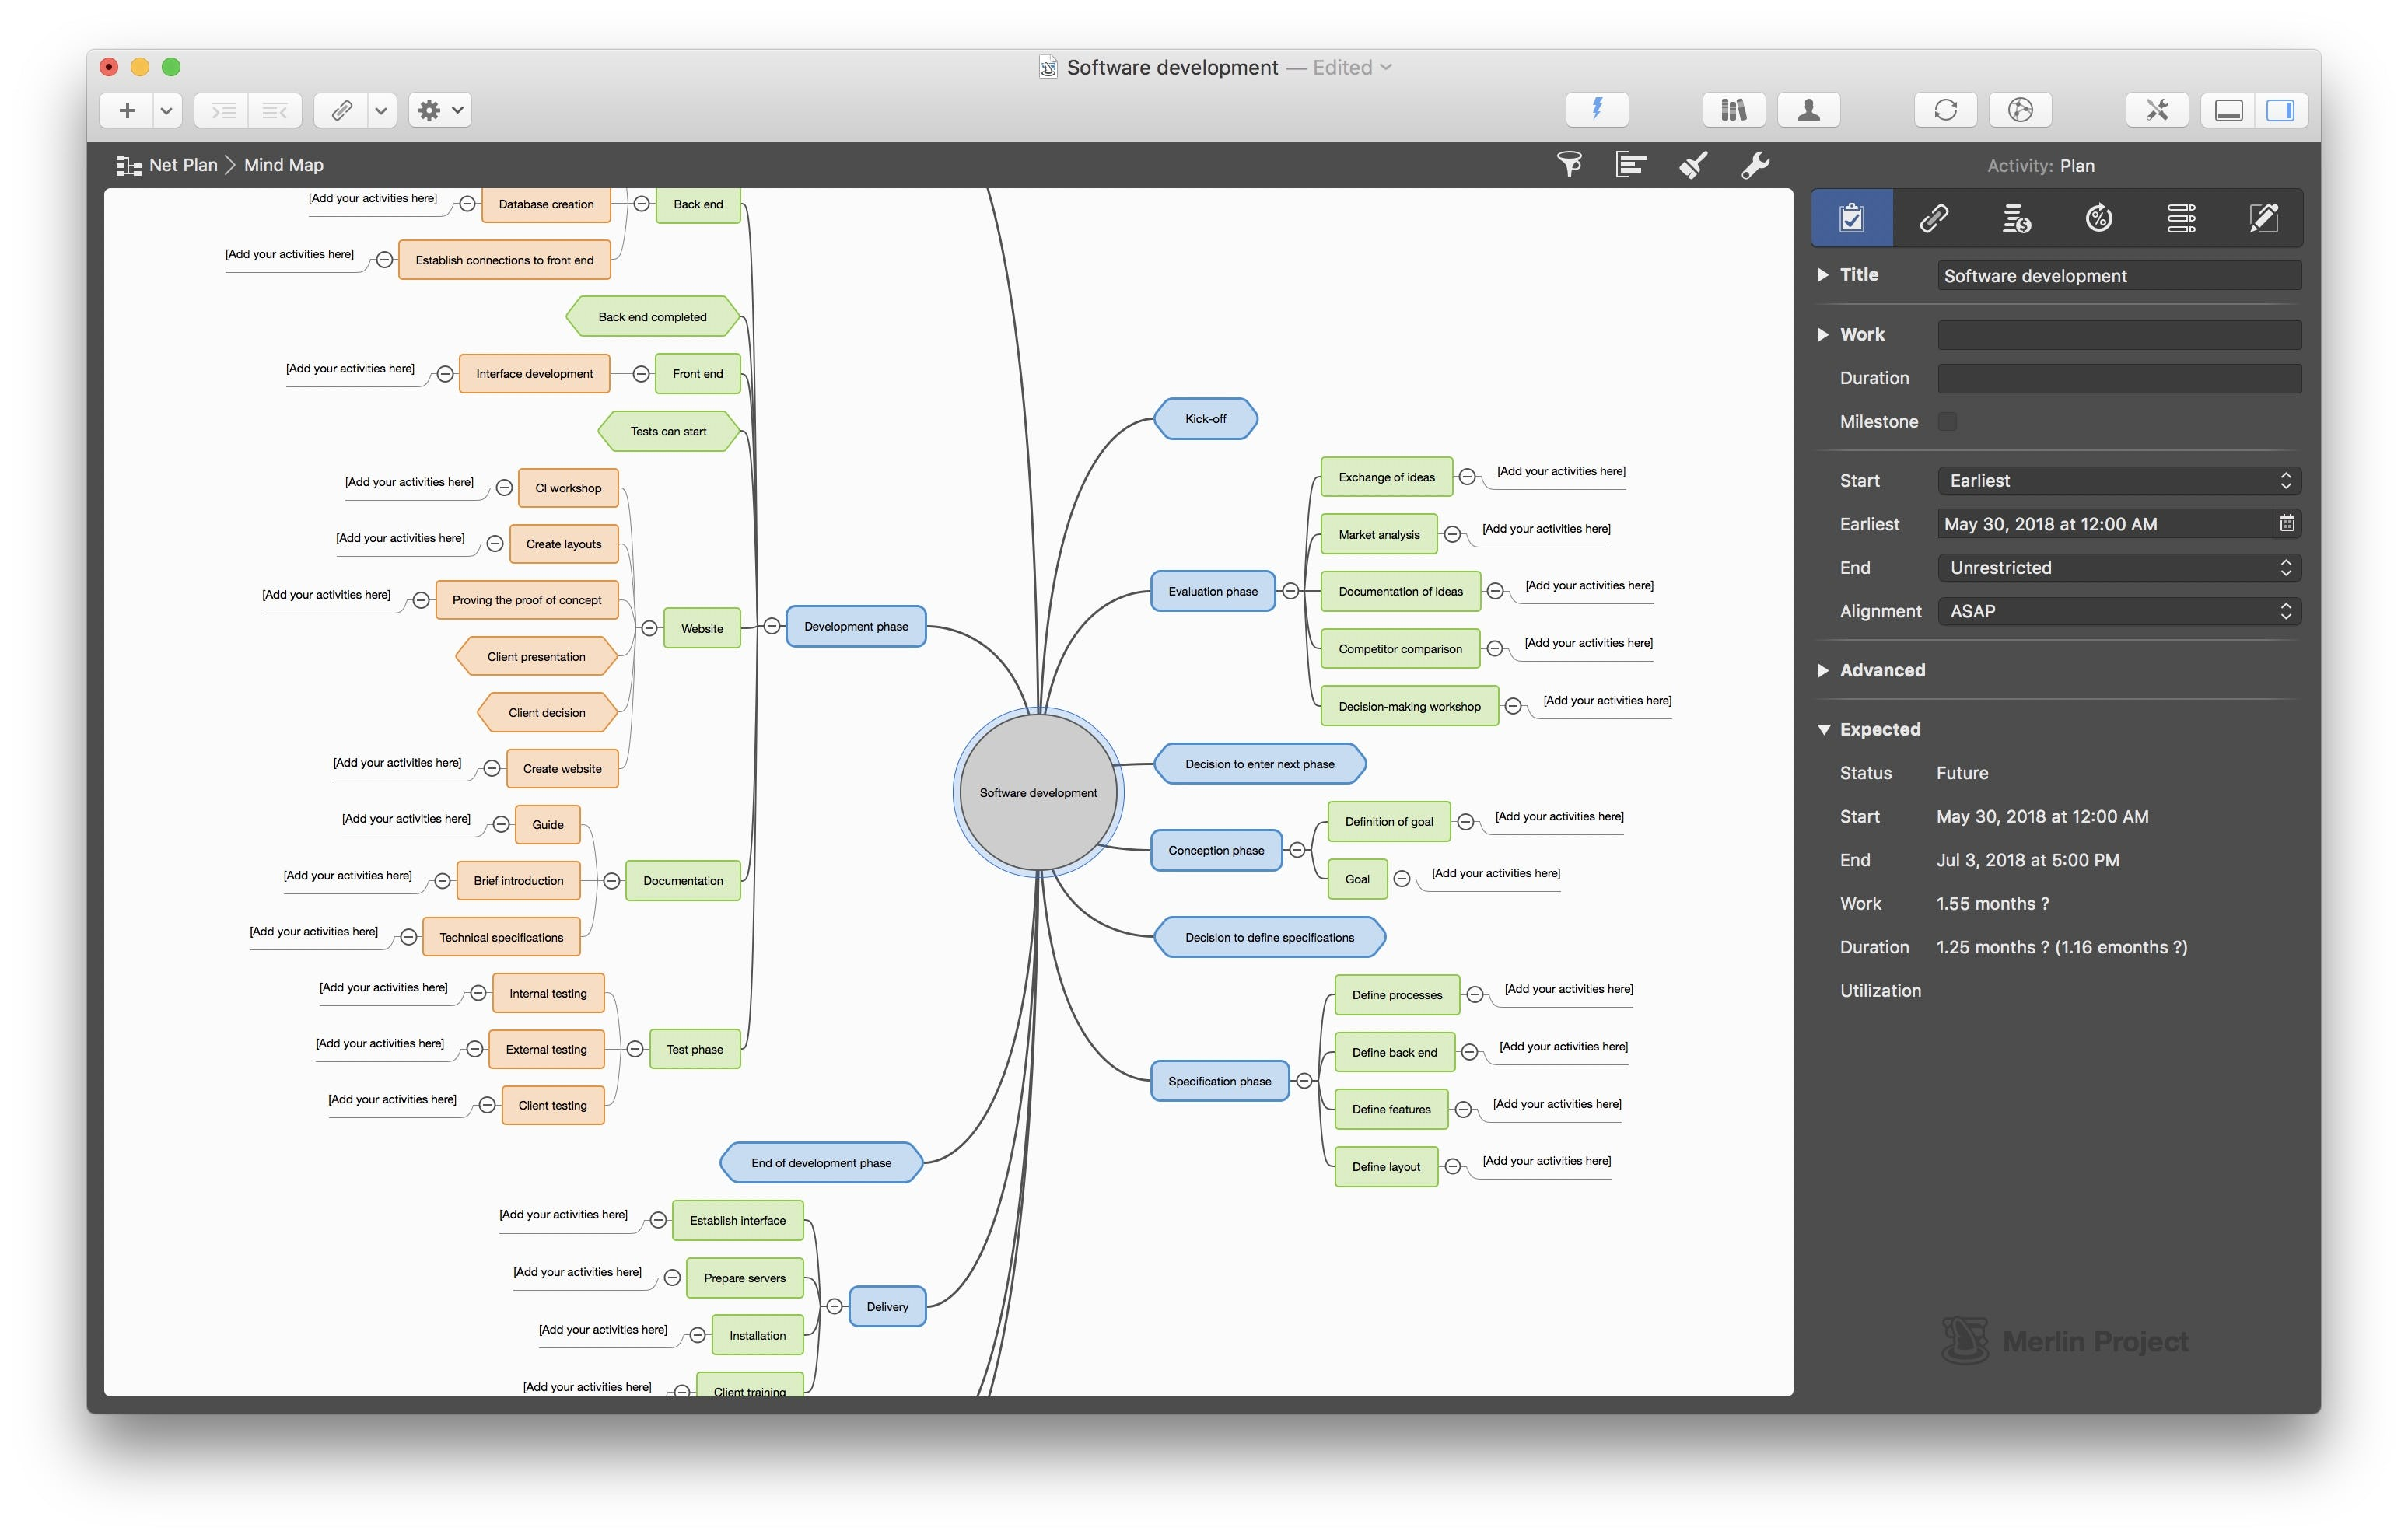 Merlin Project Software - 3